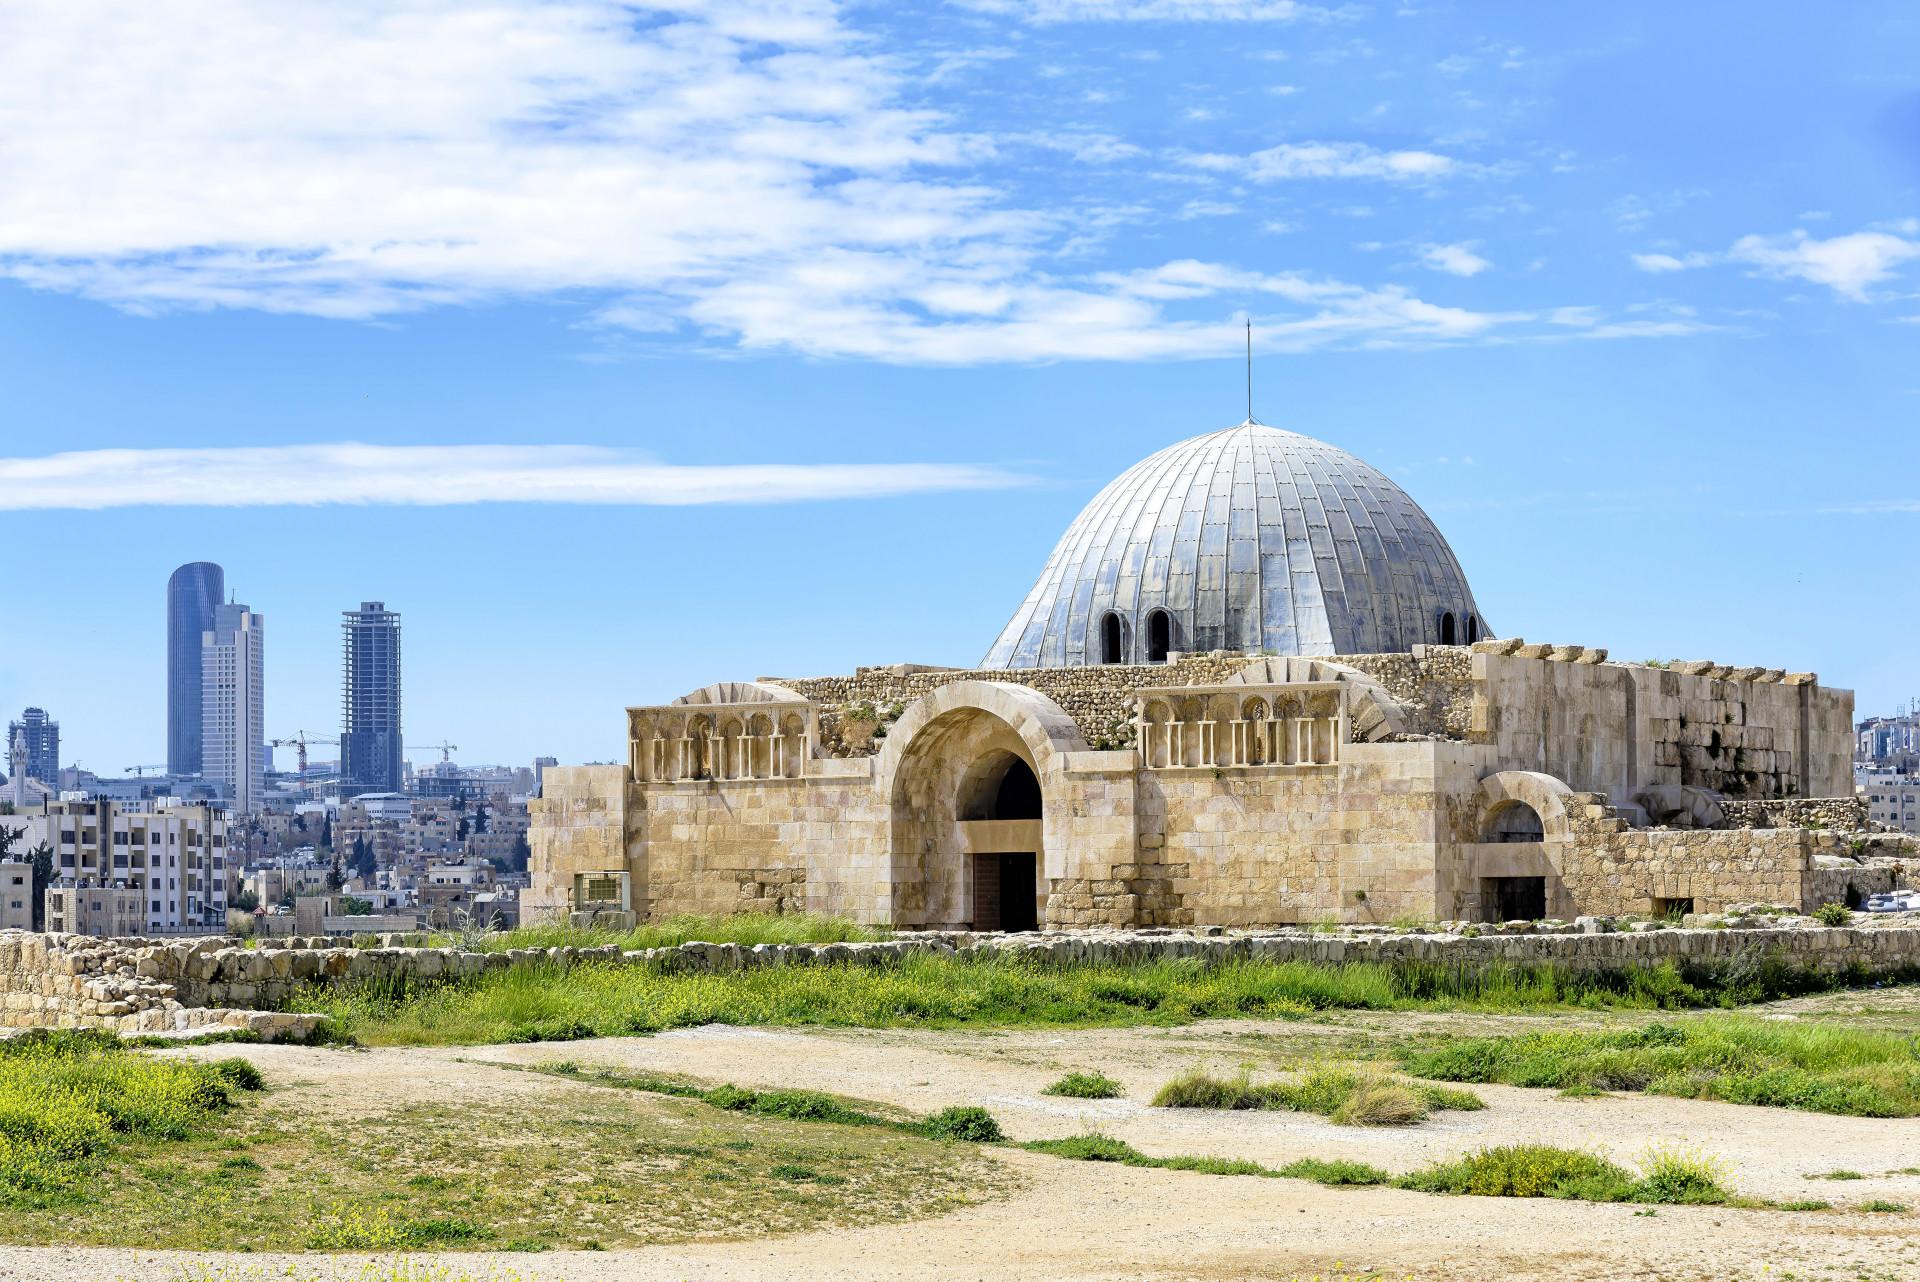 Umayyad Palace op de oude Citadel heuvel in Amman, Jordanië